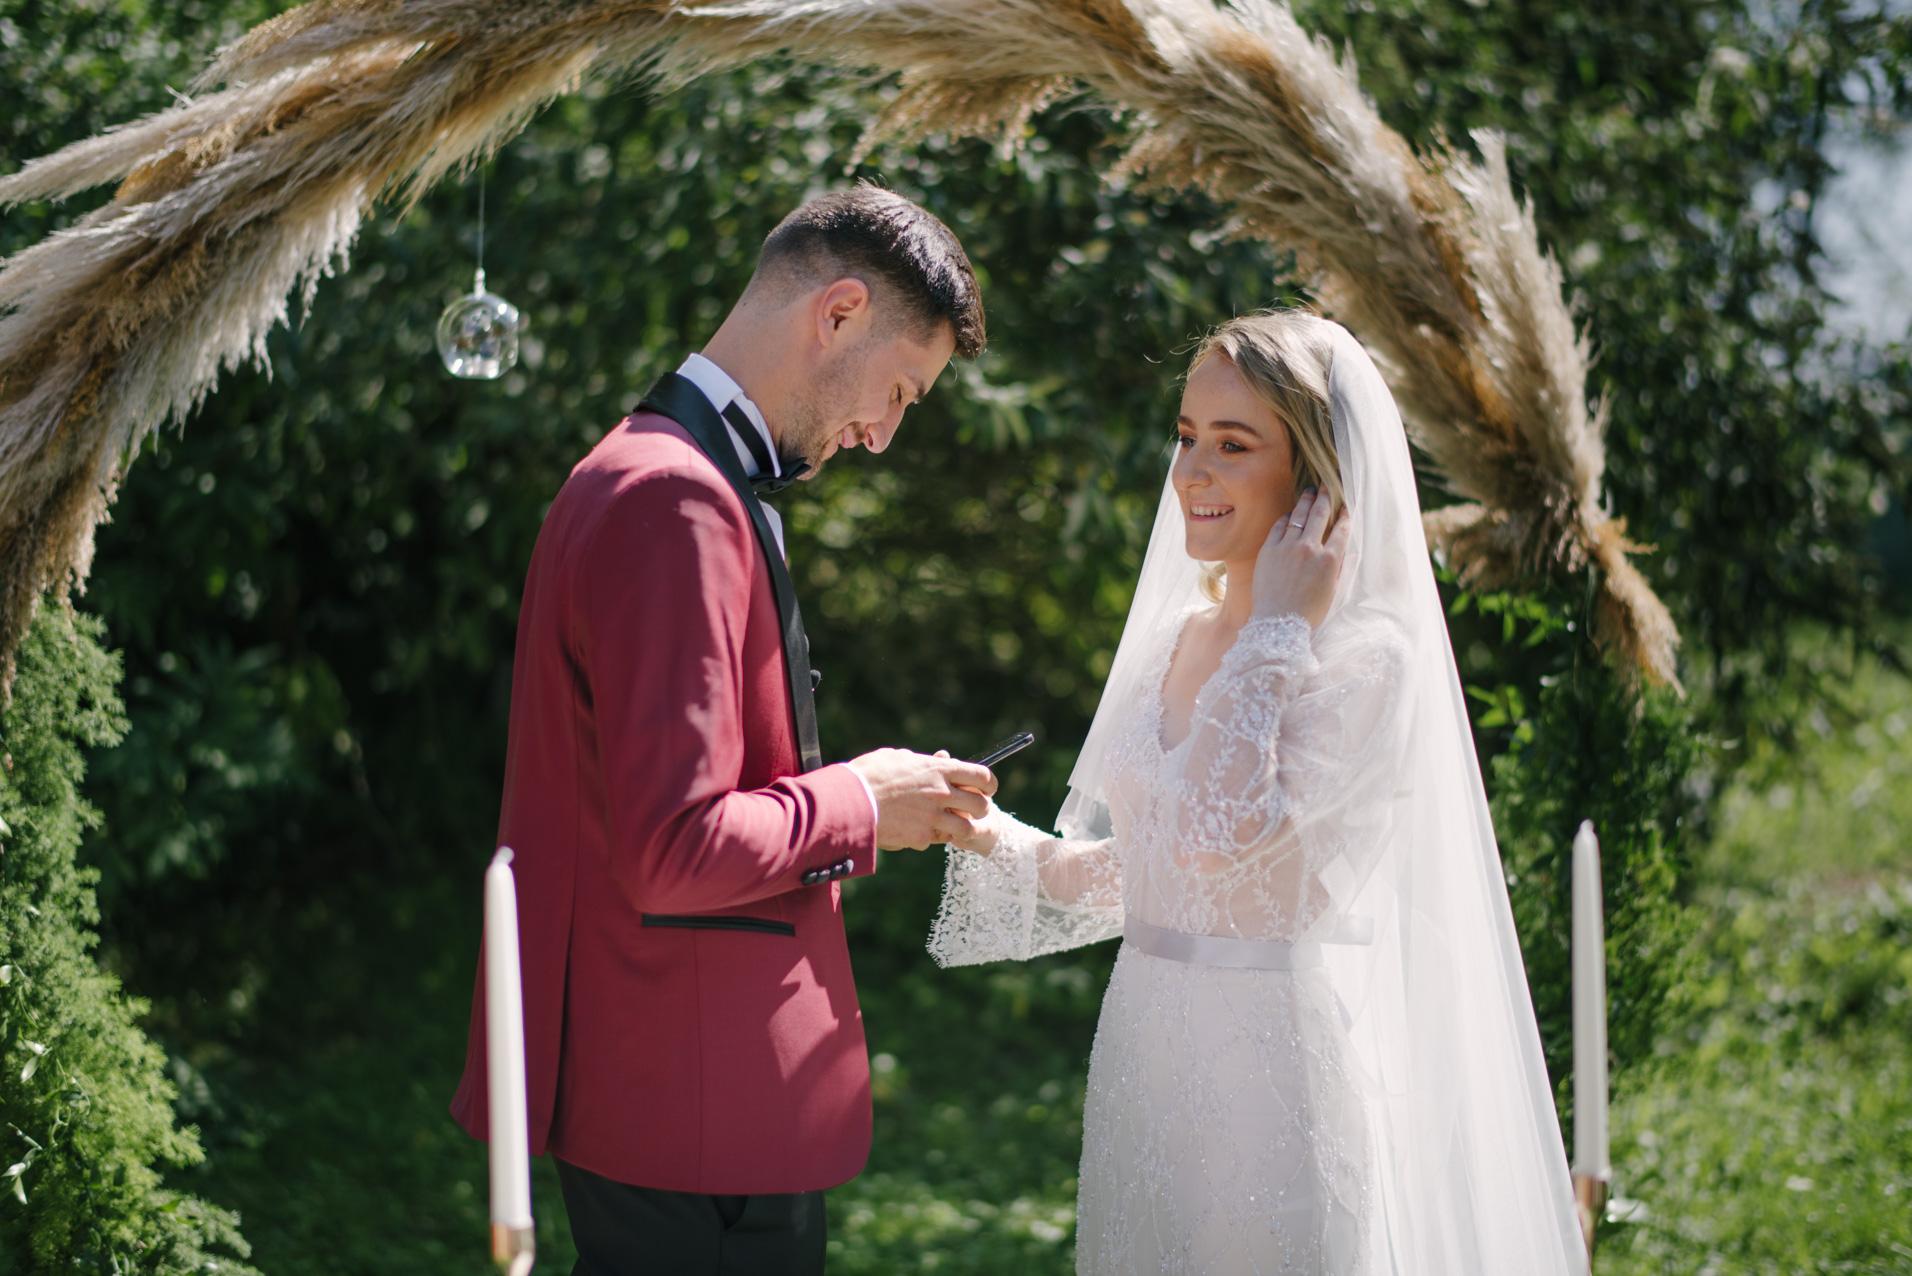 Emotional wedding vows